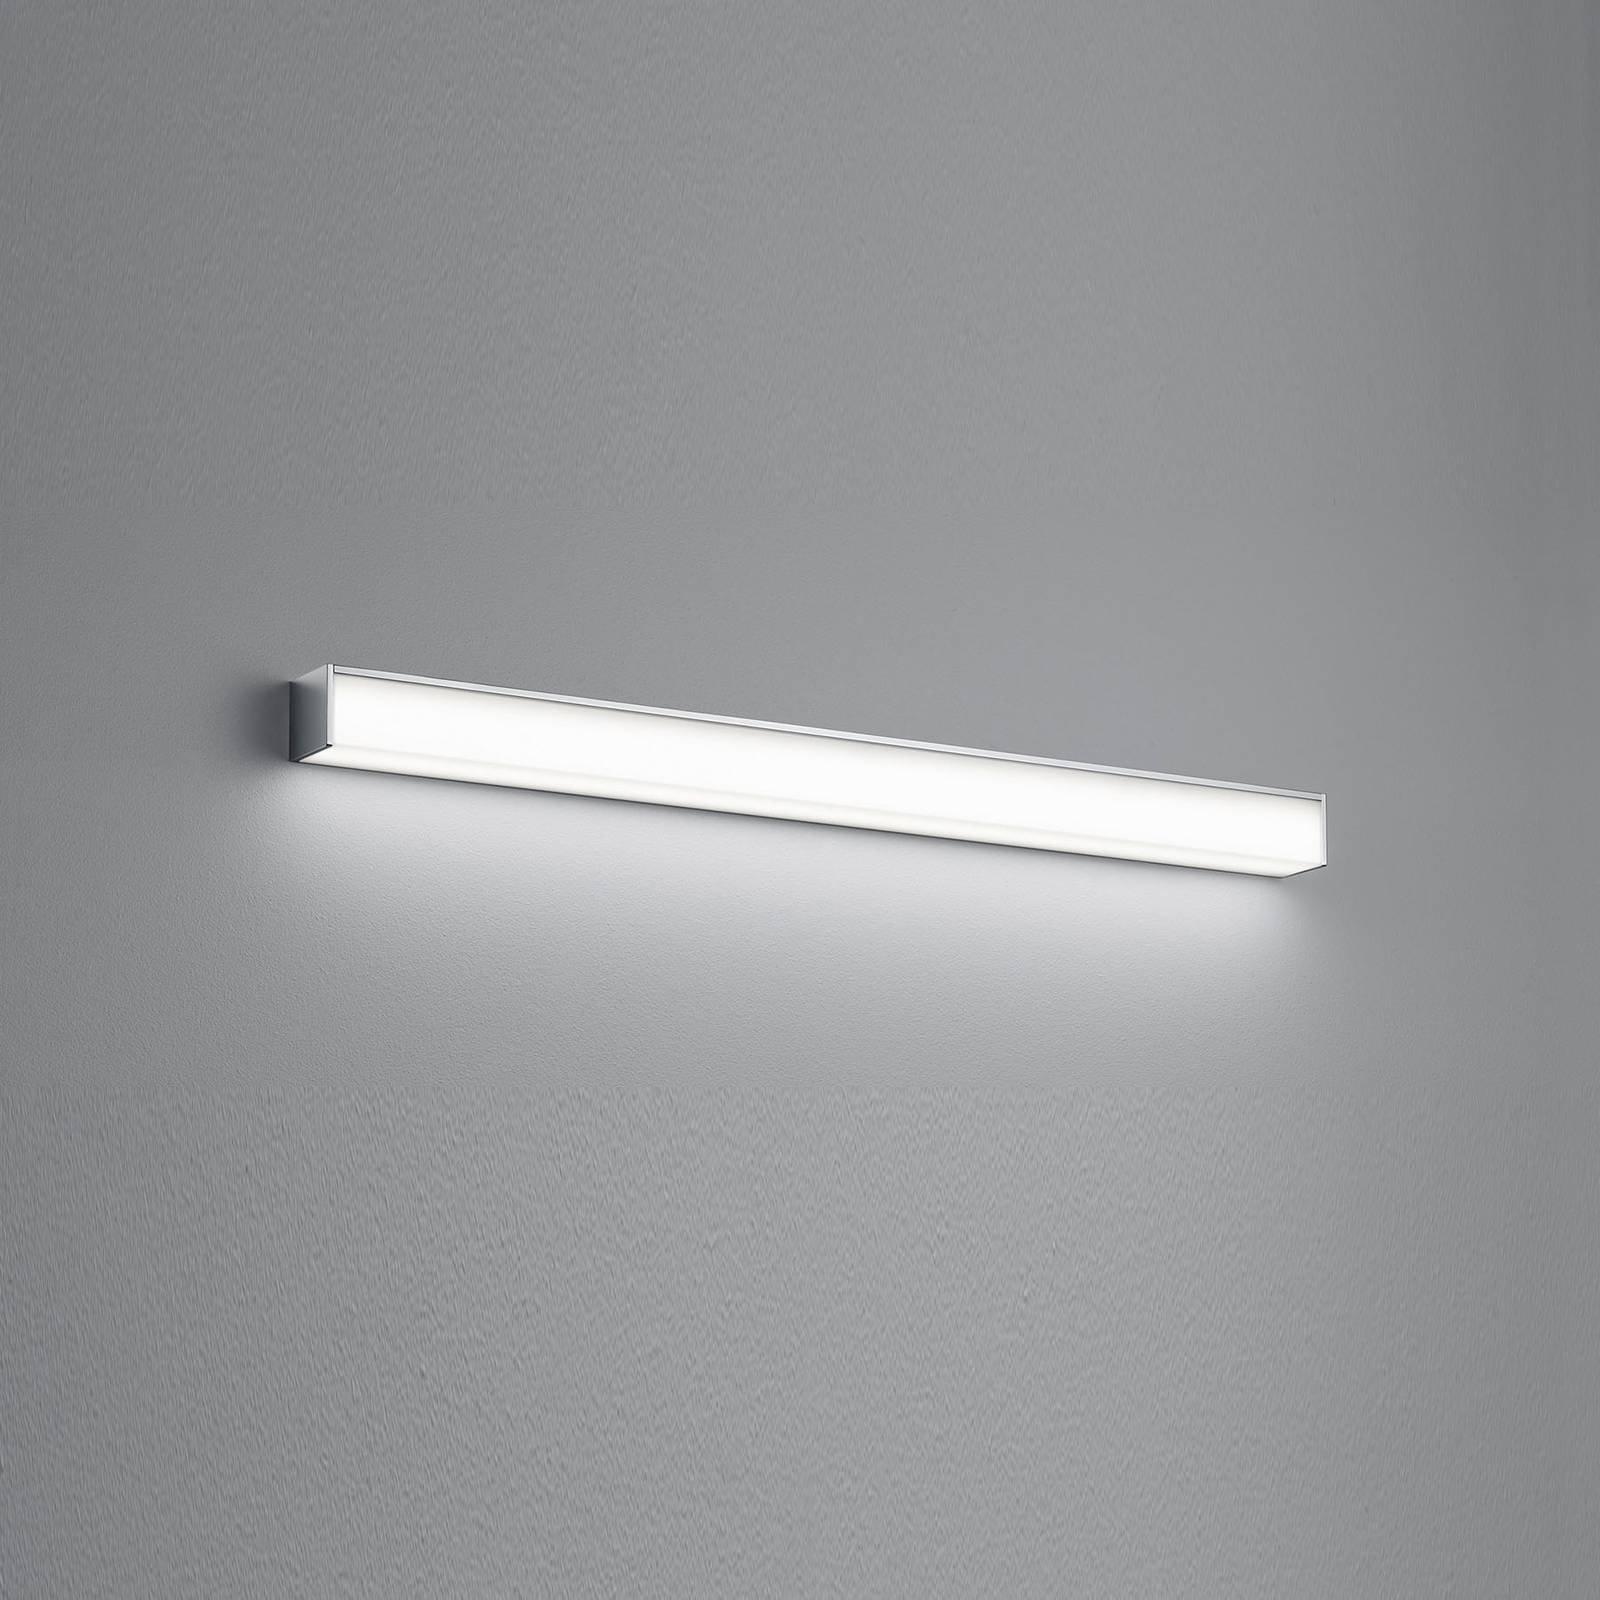 Helestra Nok LED-speillampe, 90 cm